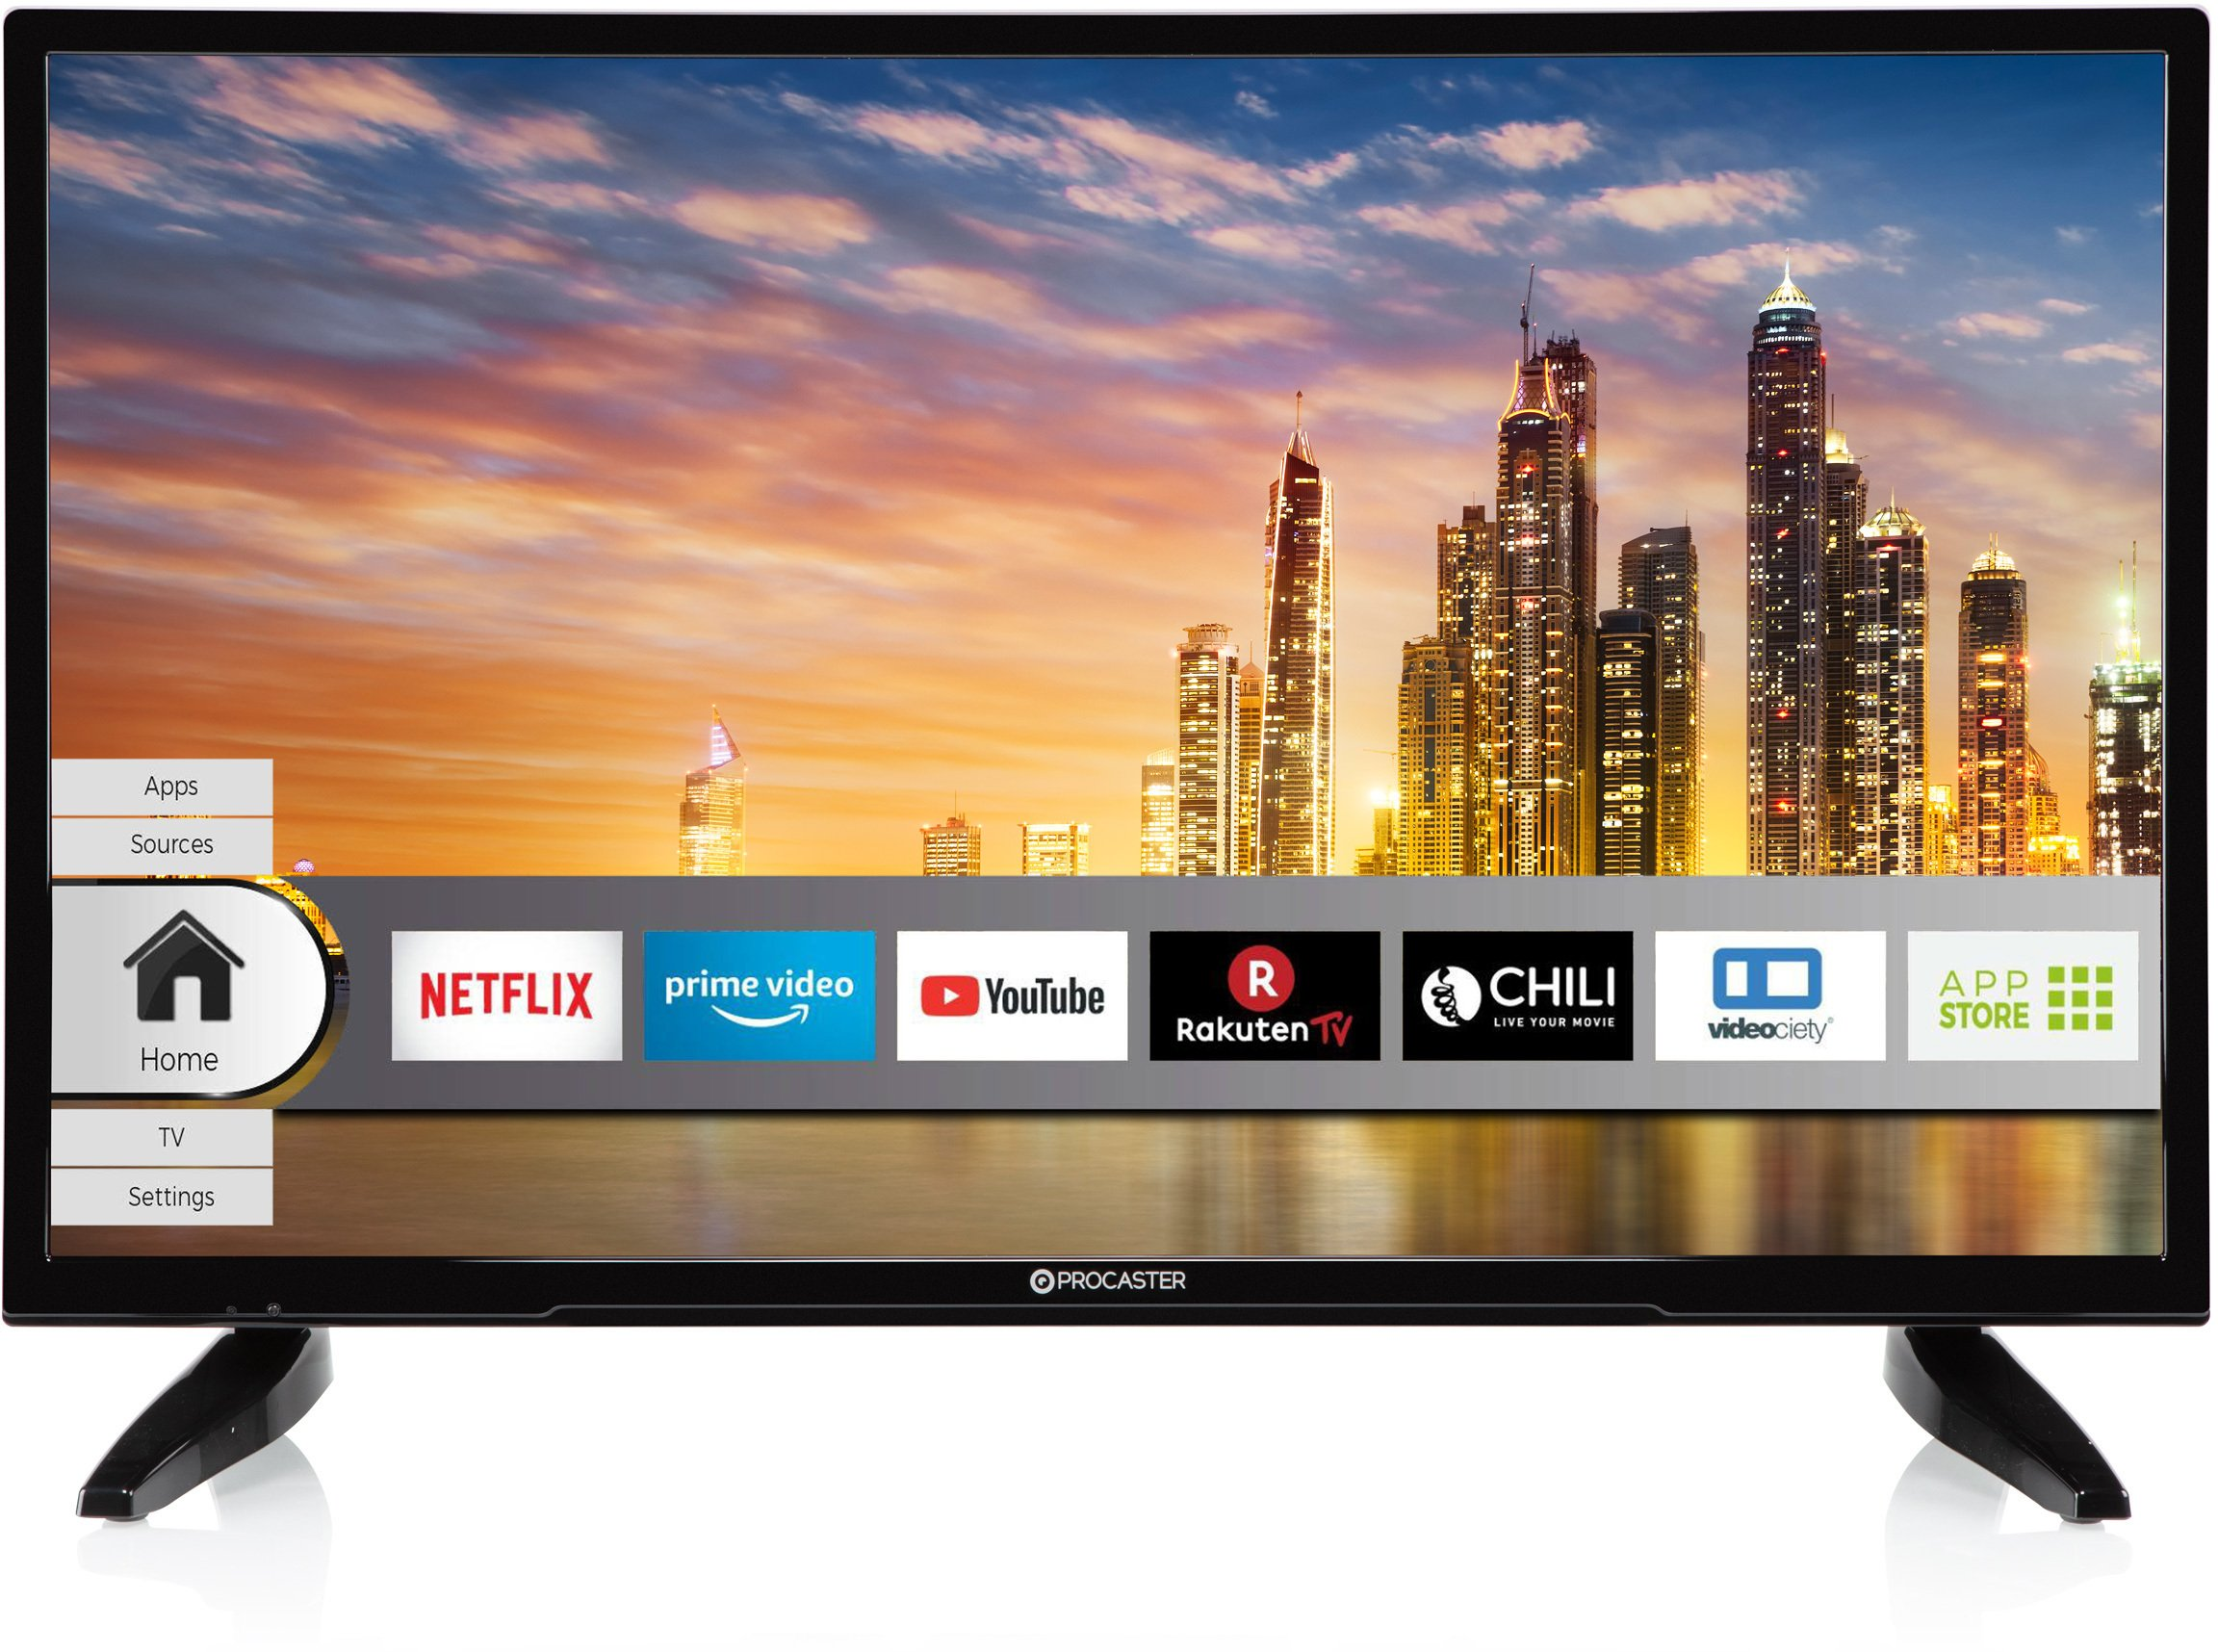 Chromecast Ei Näy Televisiossa